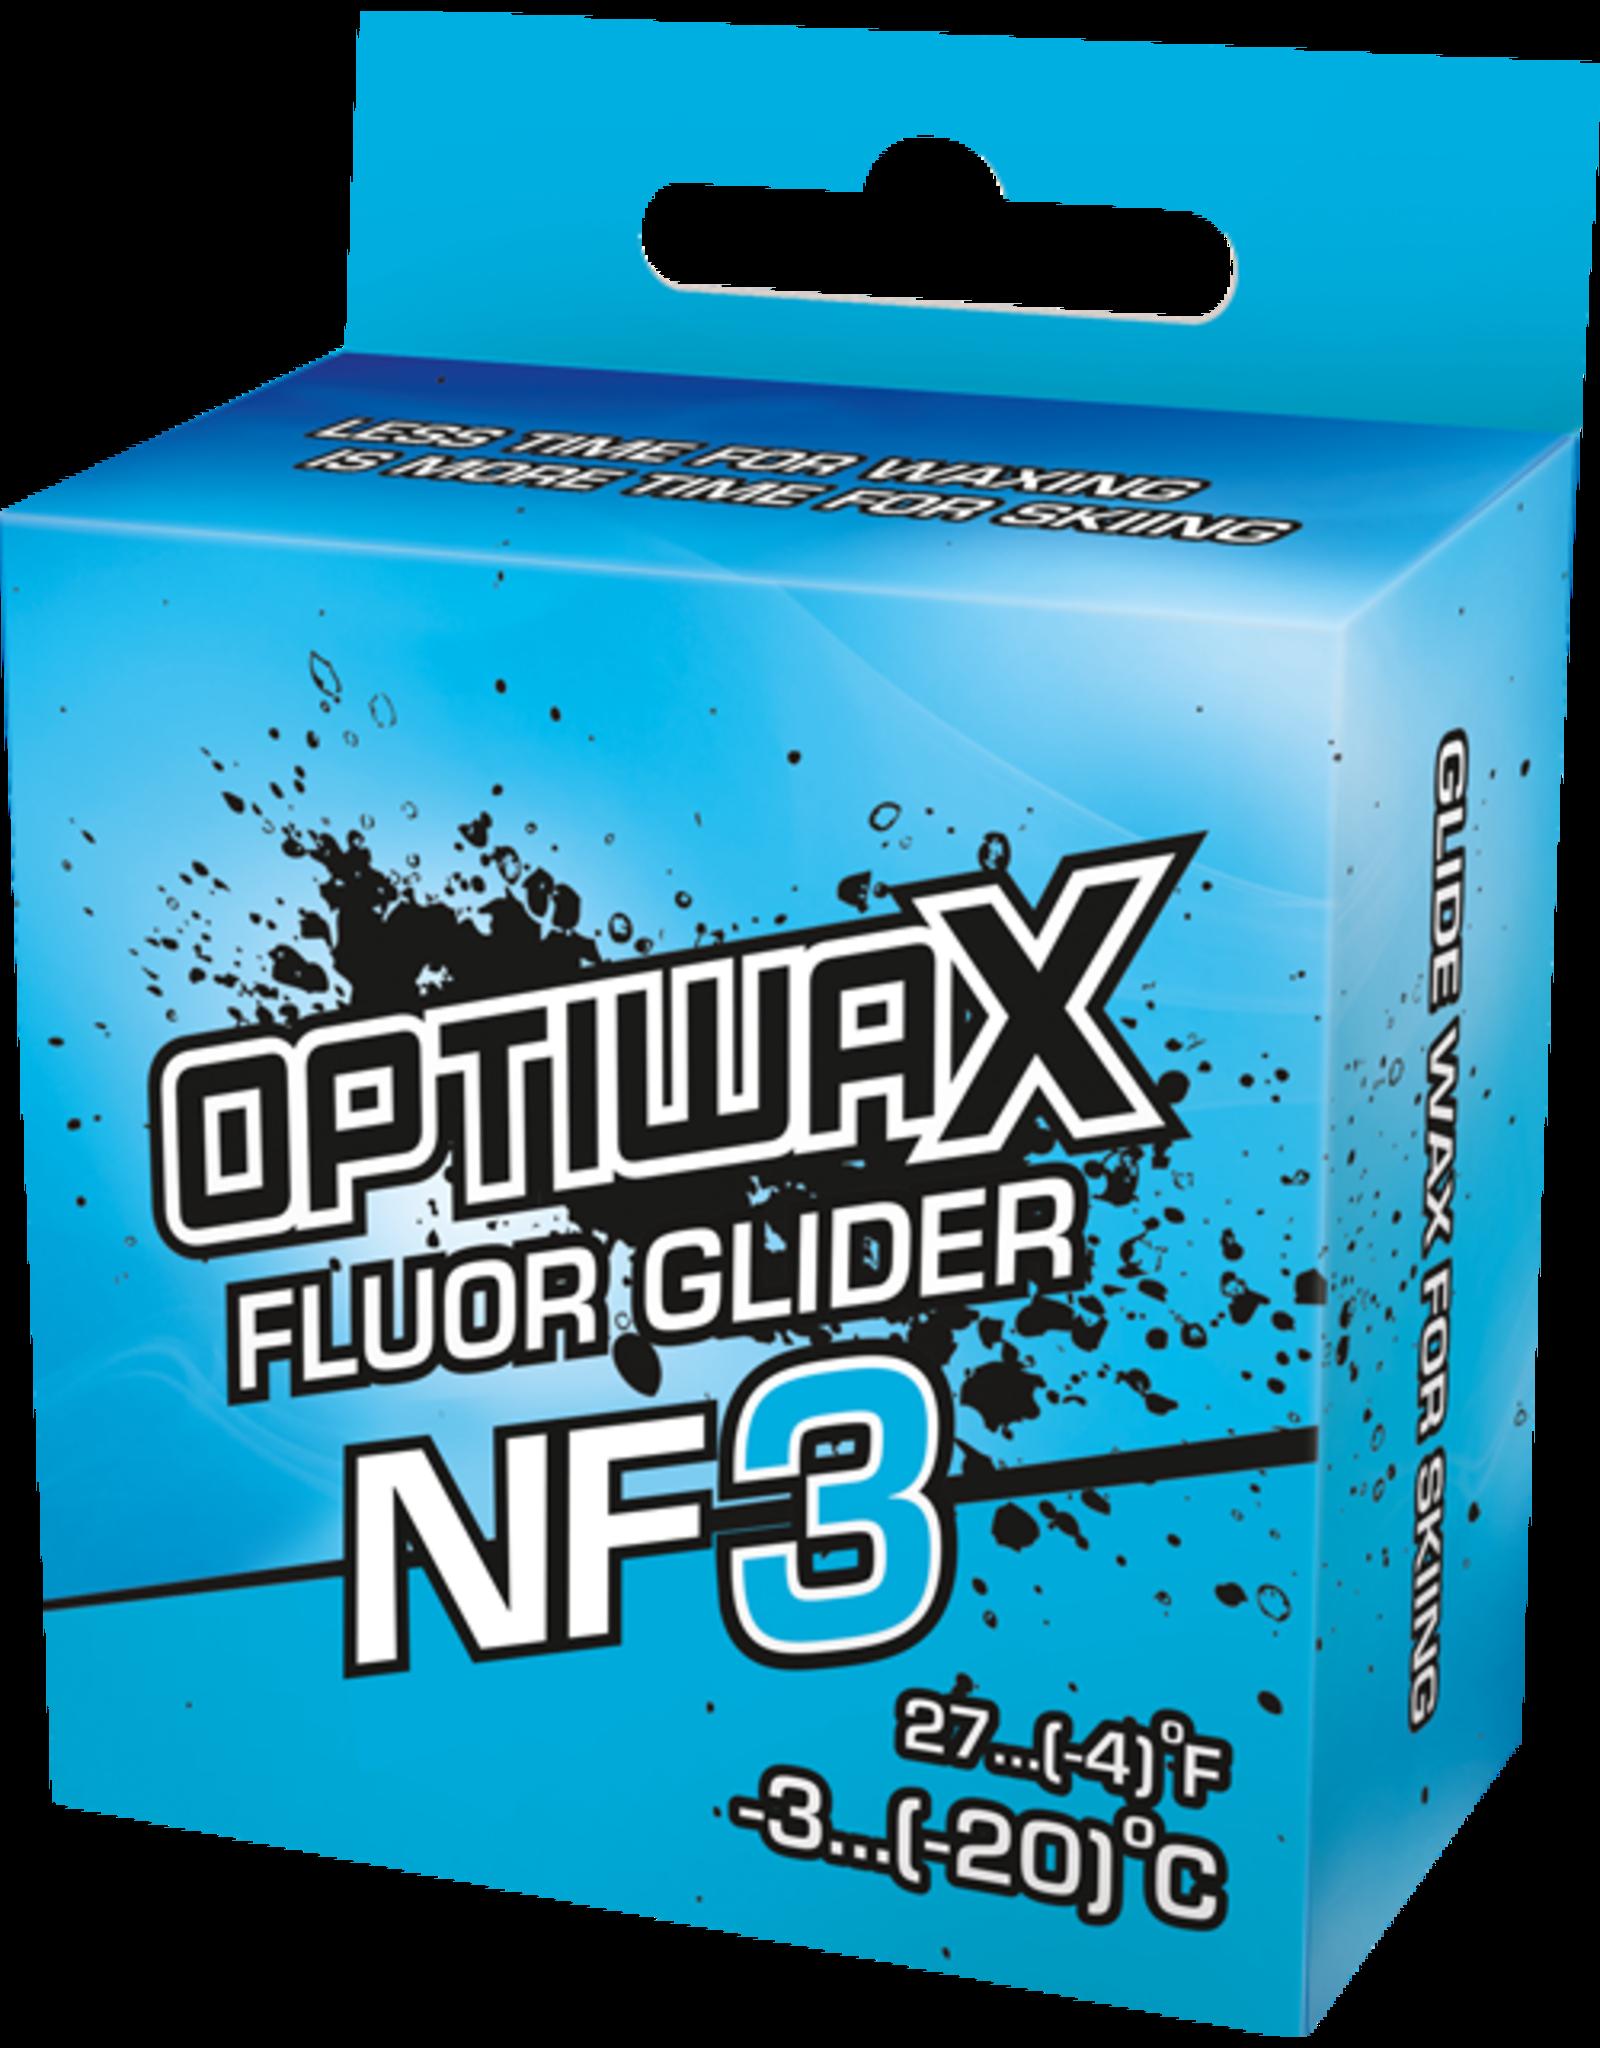 Optiwax Optiwax Glide NF3 Blue